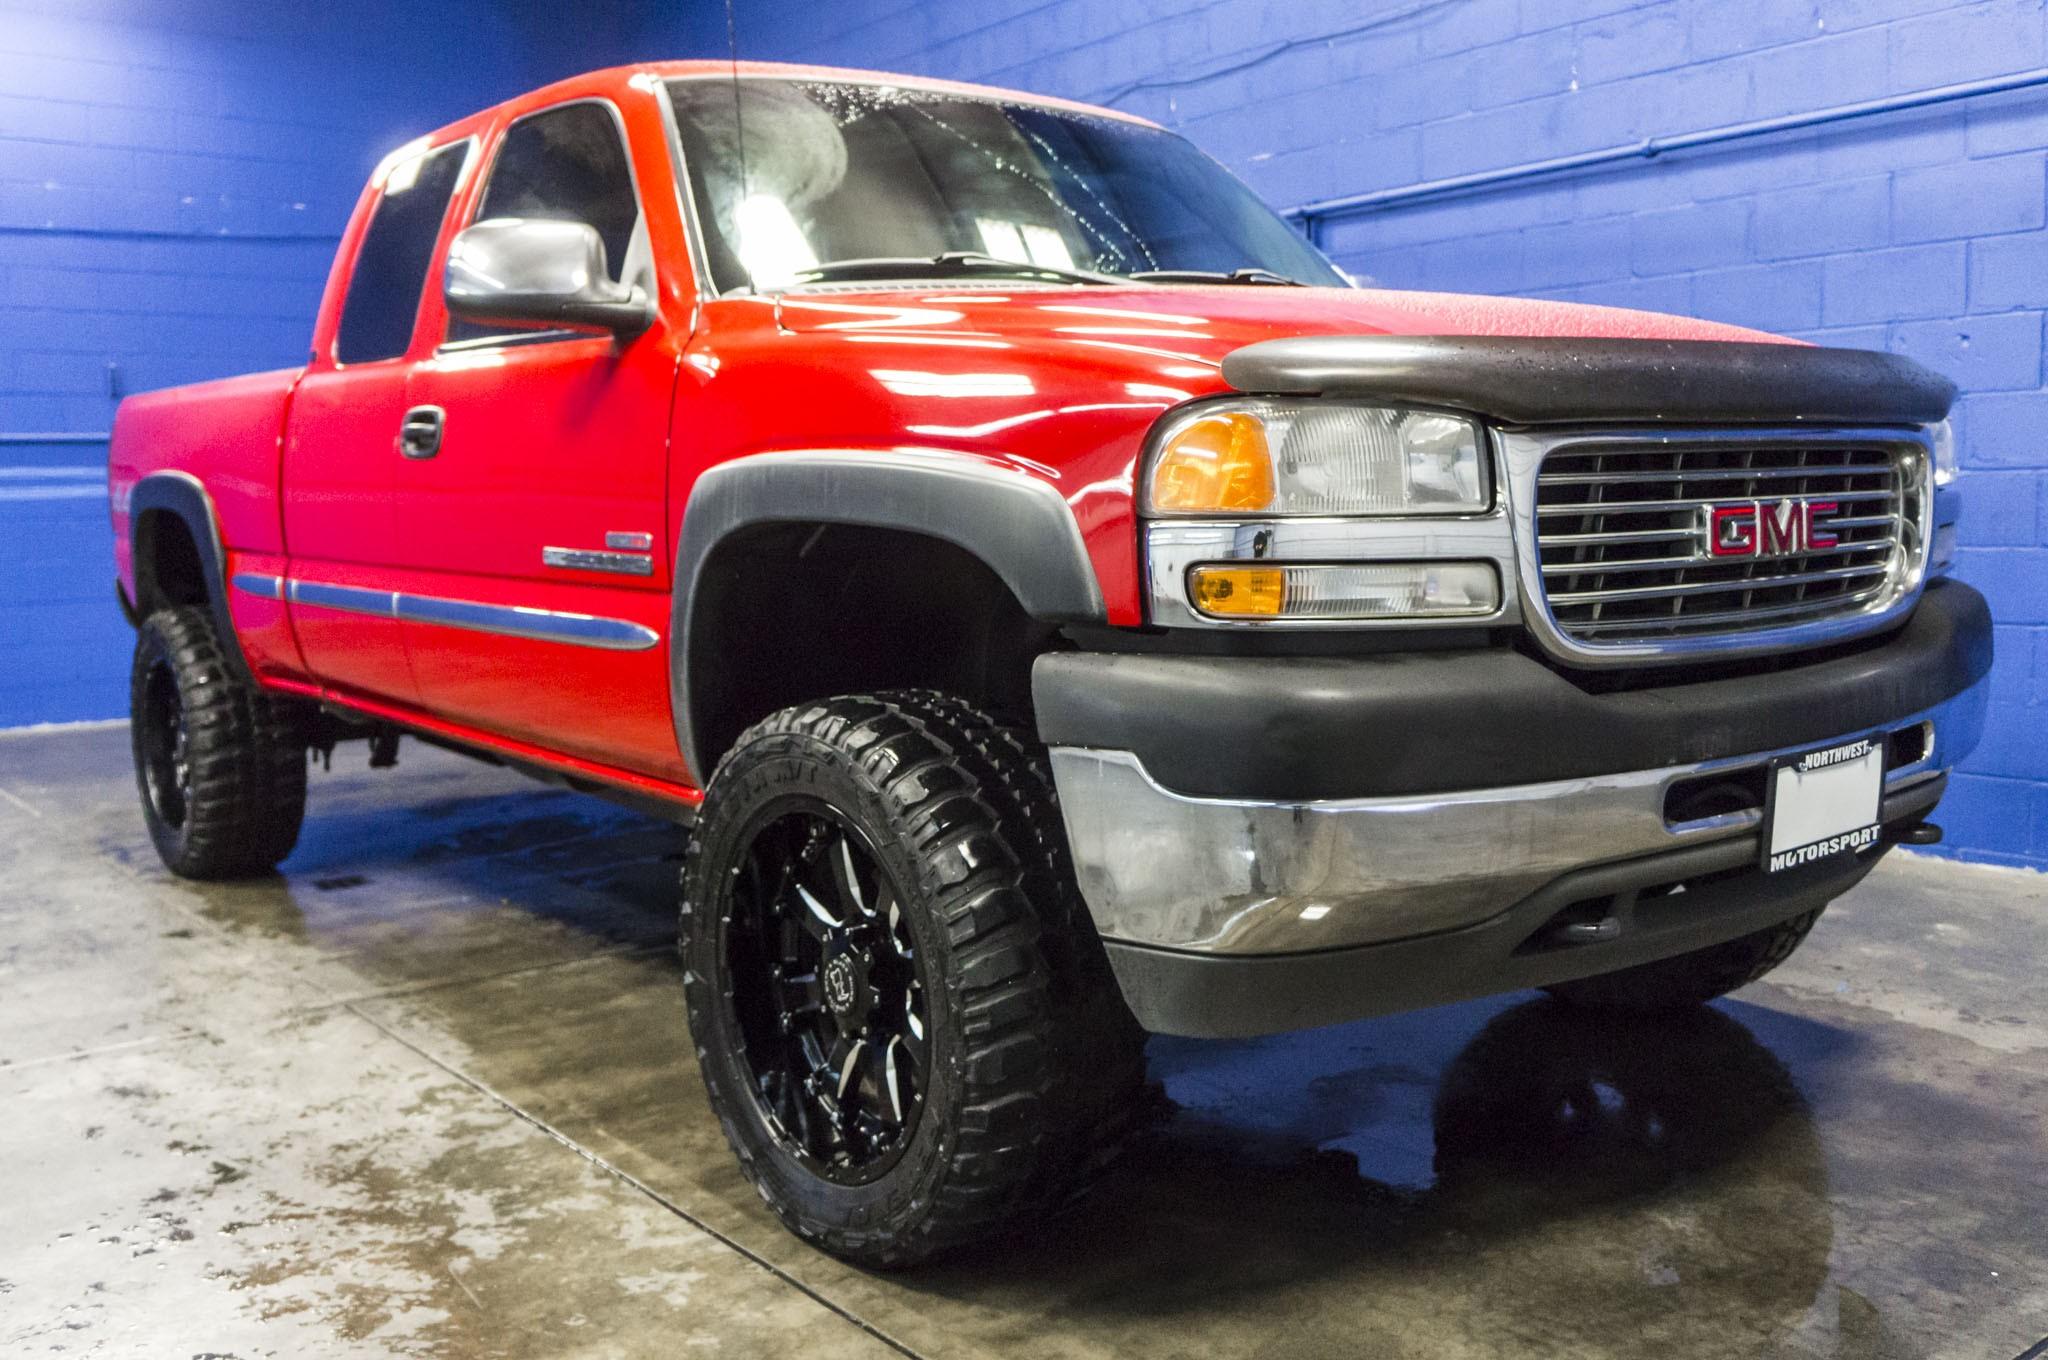 Used Lifted 2002 GMC Sierra 2500HD SLE 4x4 Diesel Truck For Sale - 34355M